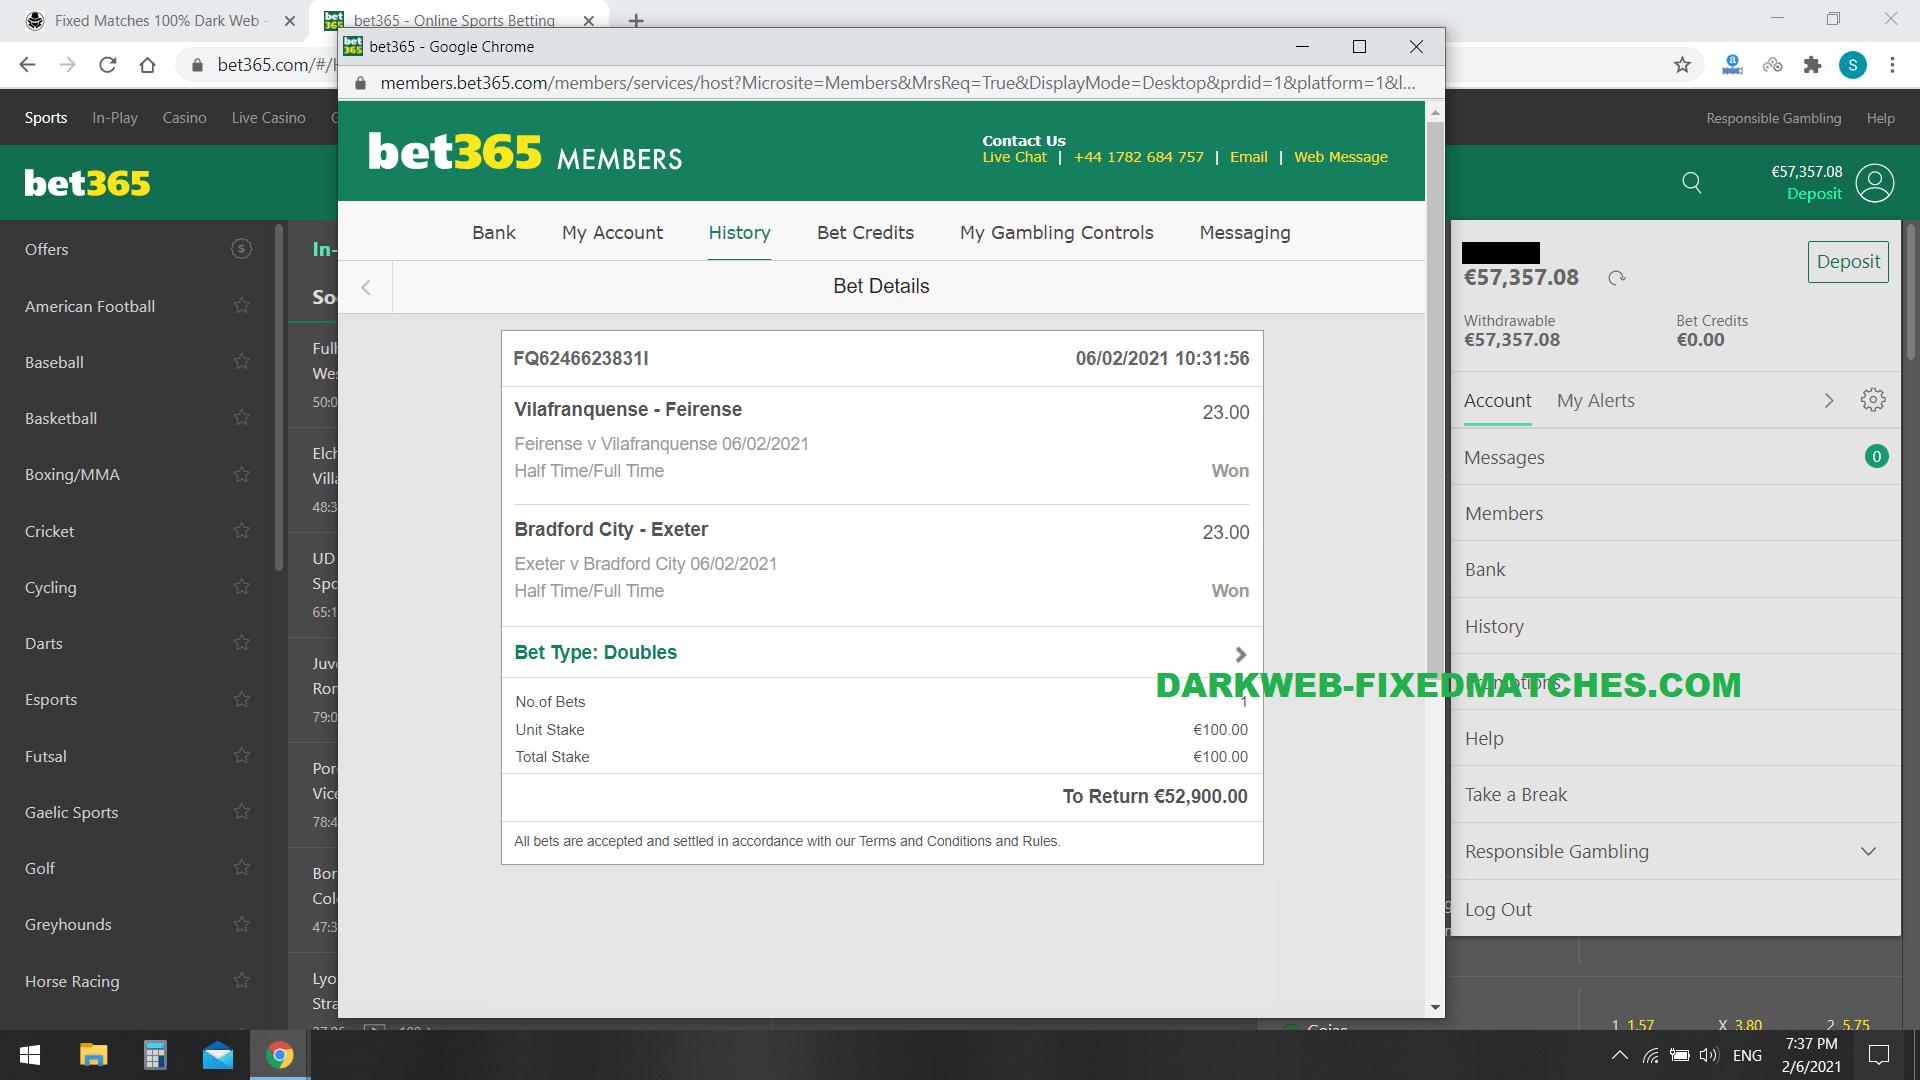 double fixed matches ht ft won 06 02 dark web